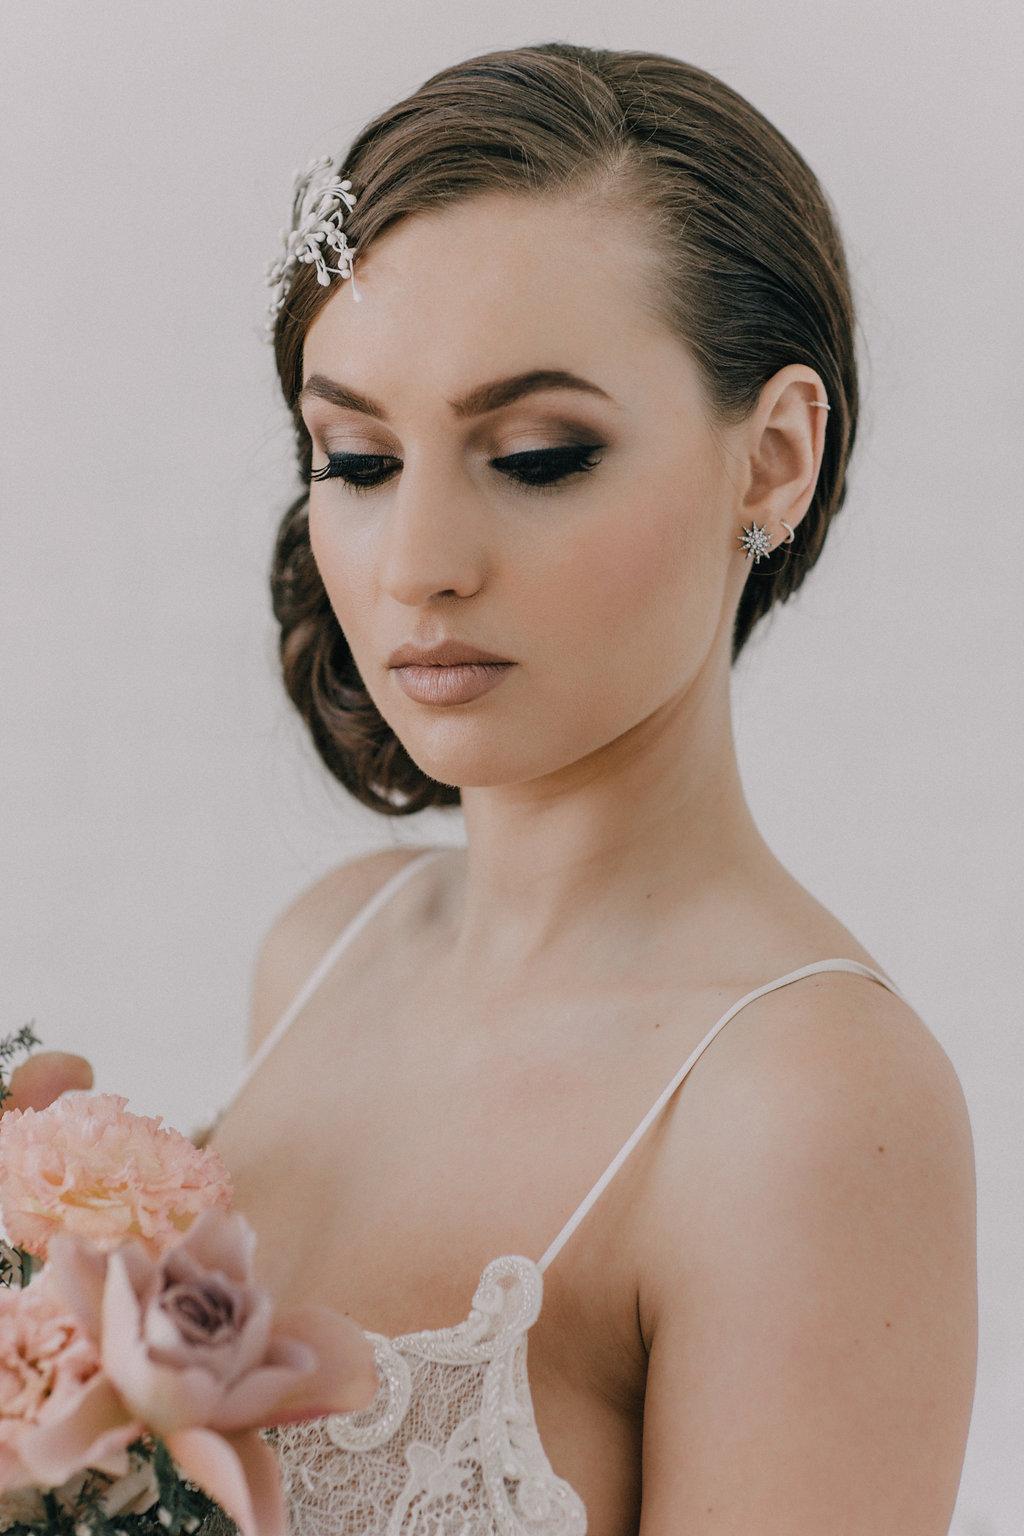 engle-olson-lady-vamp-look-book-jenna-mahr-photography-22.jpg